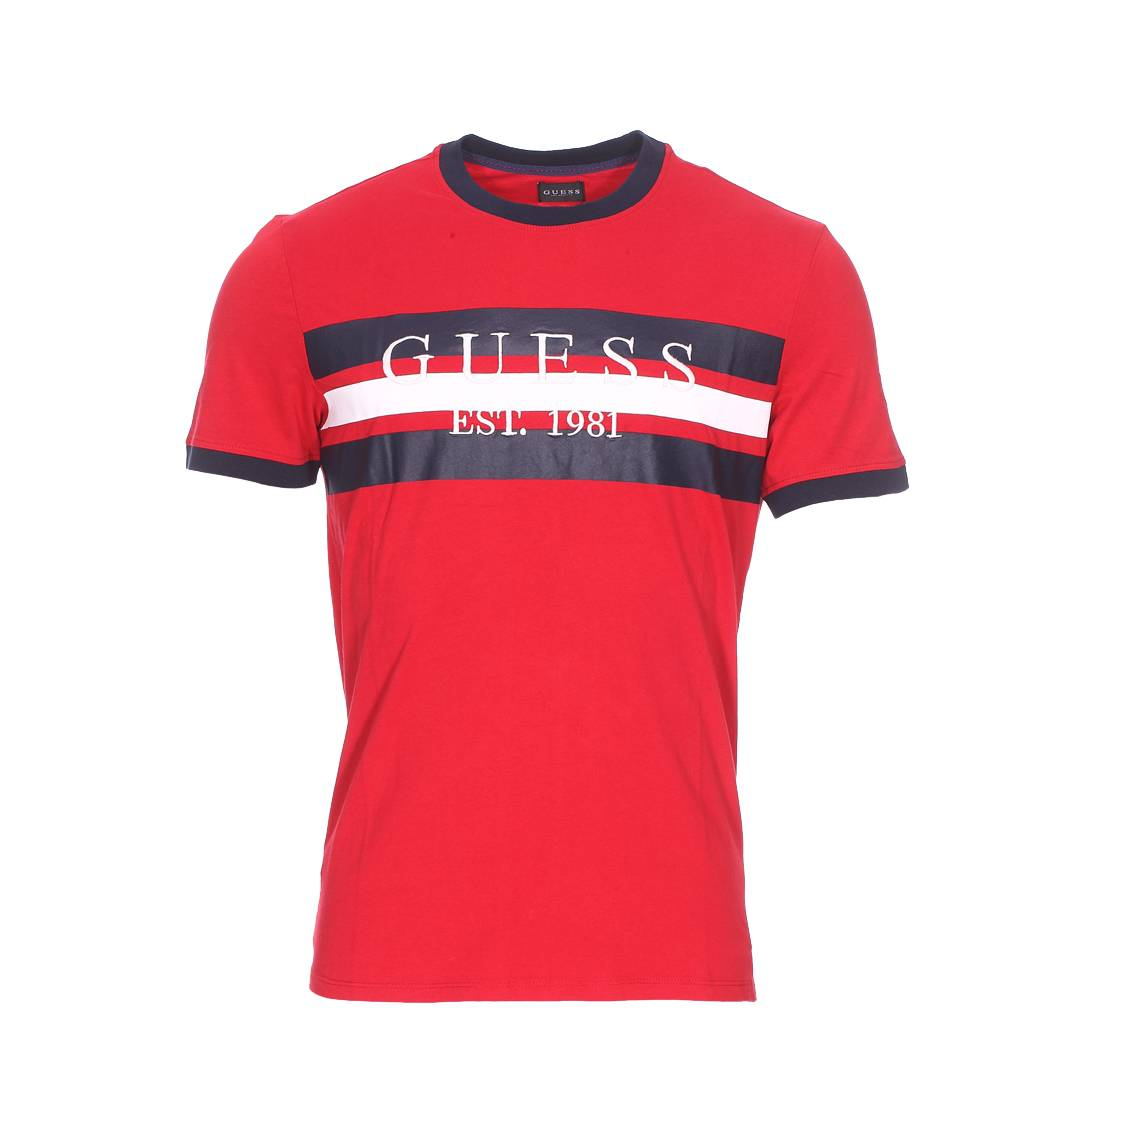 Tee-shirt col rond  garth en coton rouge